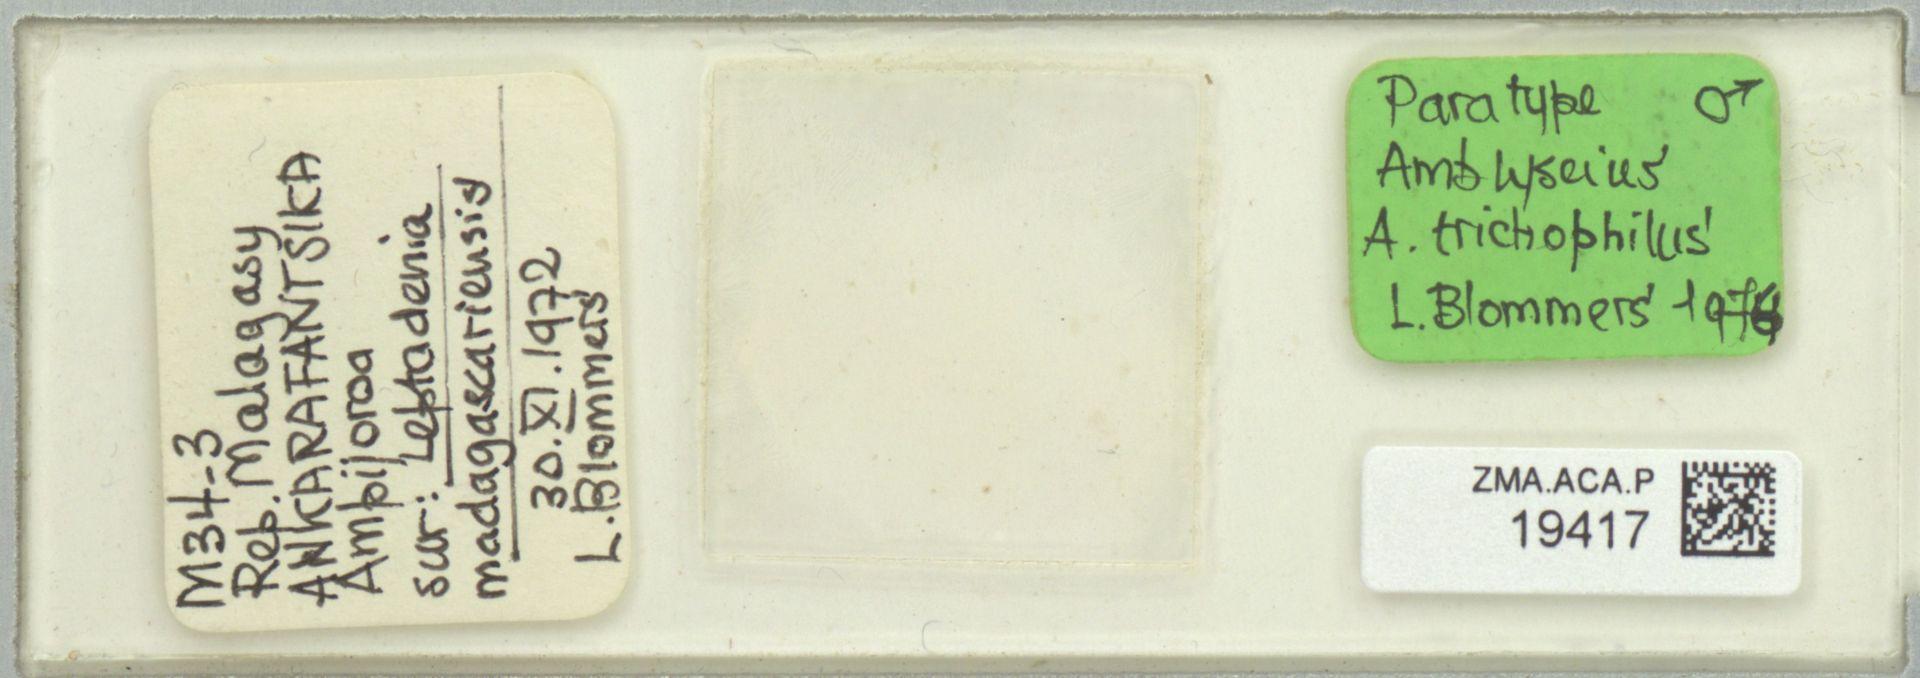 ZMA.ACA.P.19417 | Amblyseius (Amblyseius) trichophilus Blommers, 1976